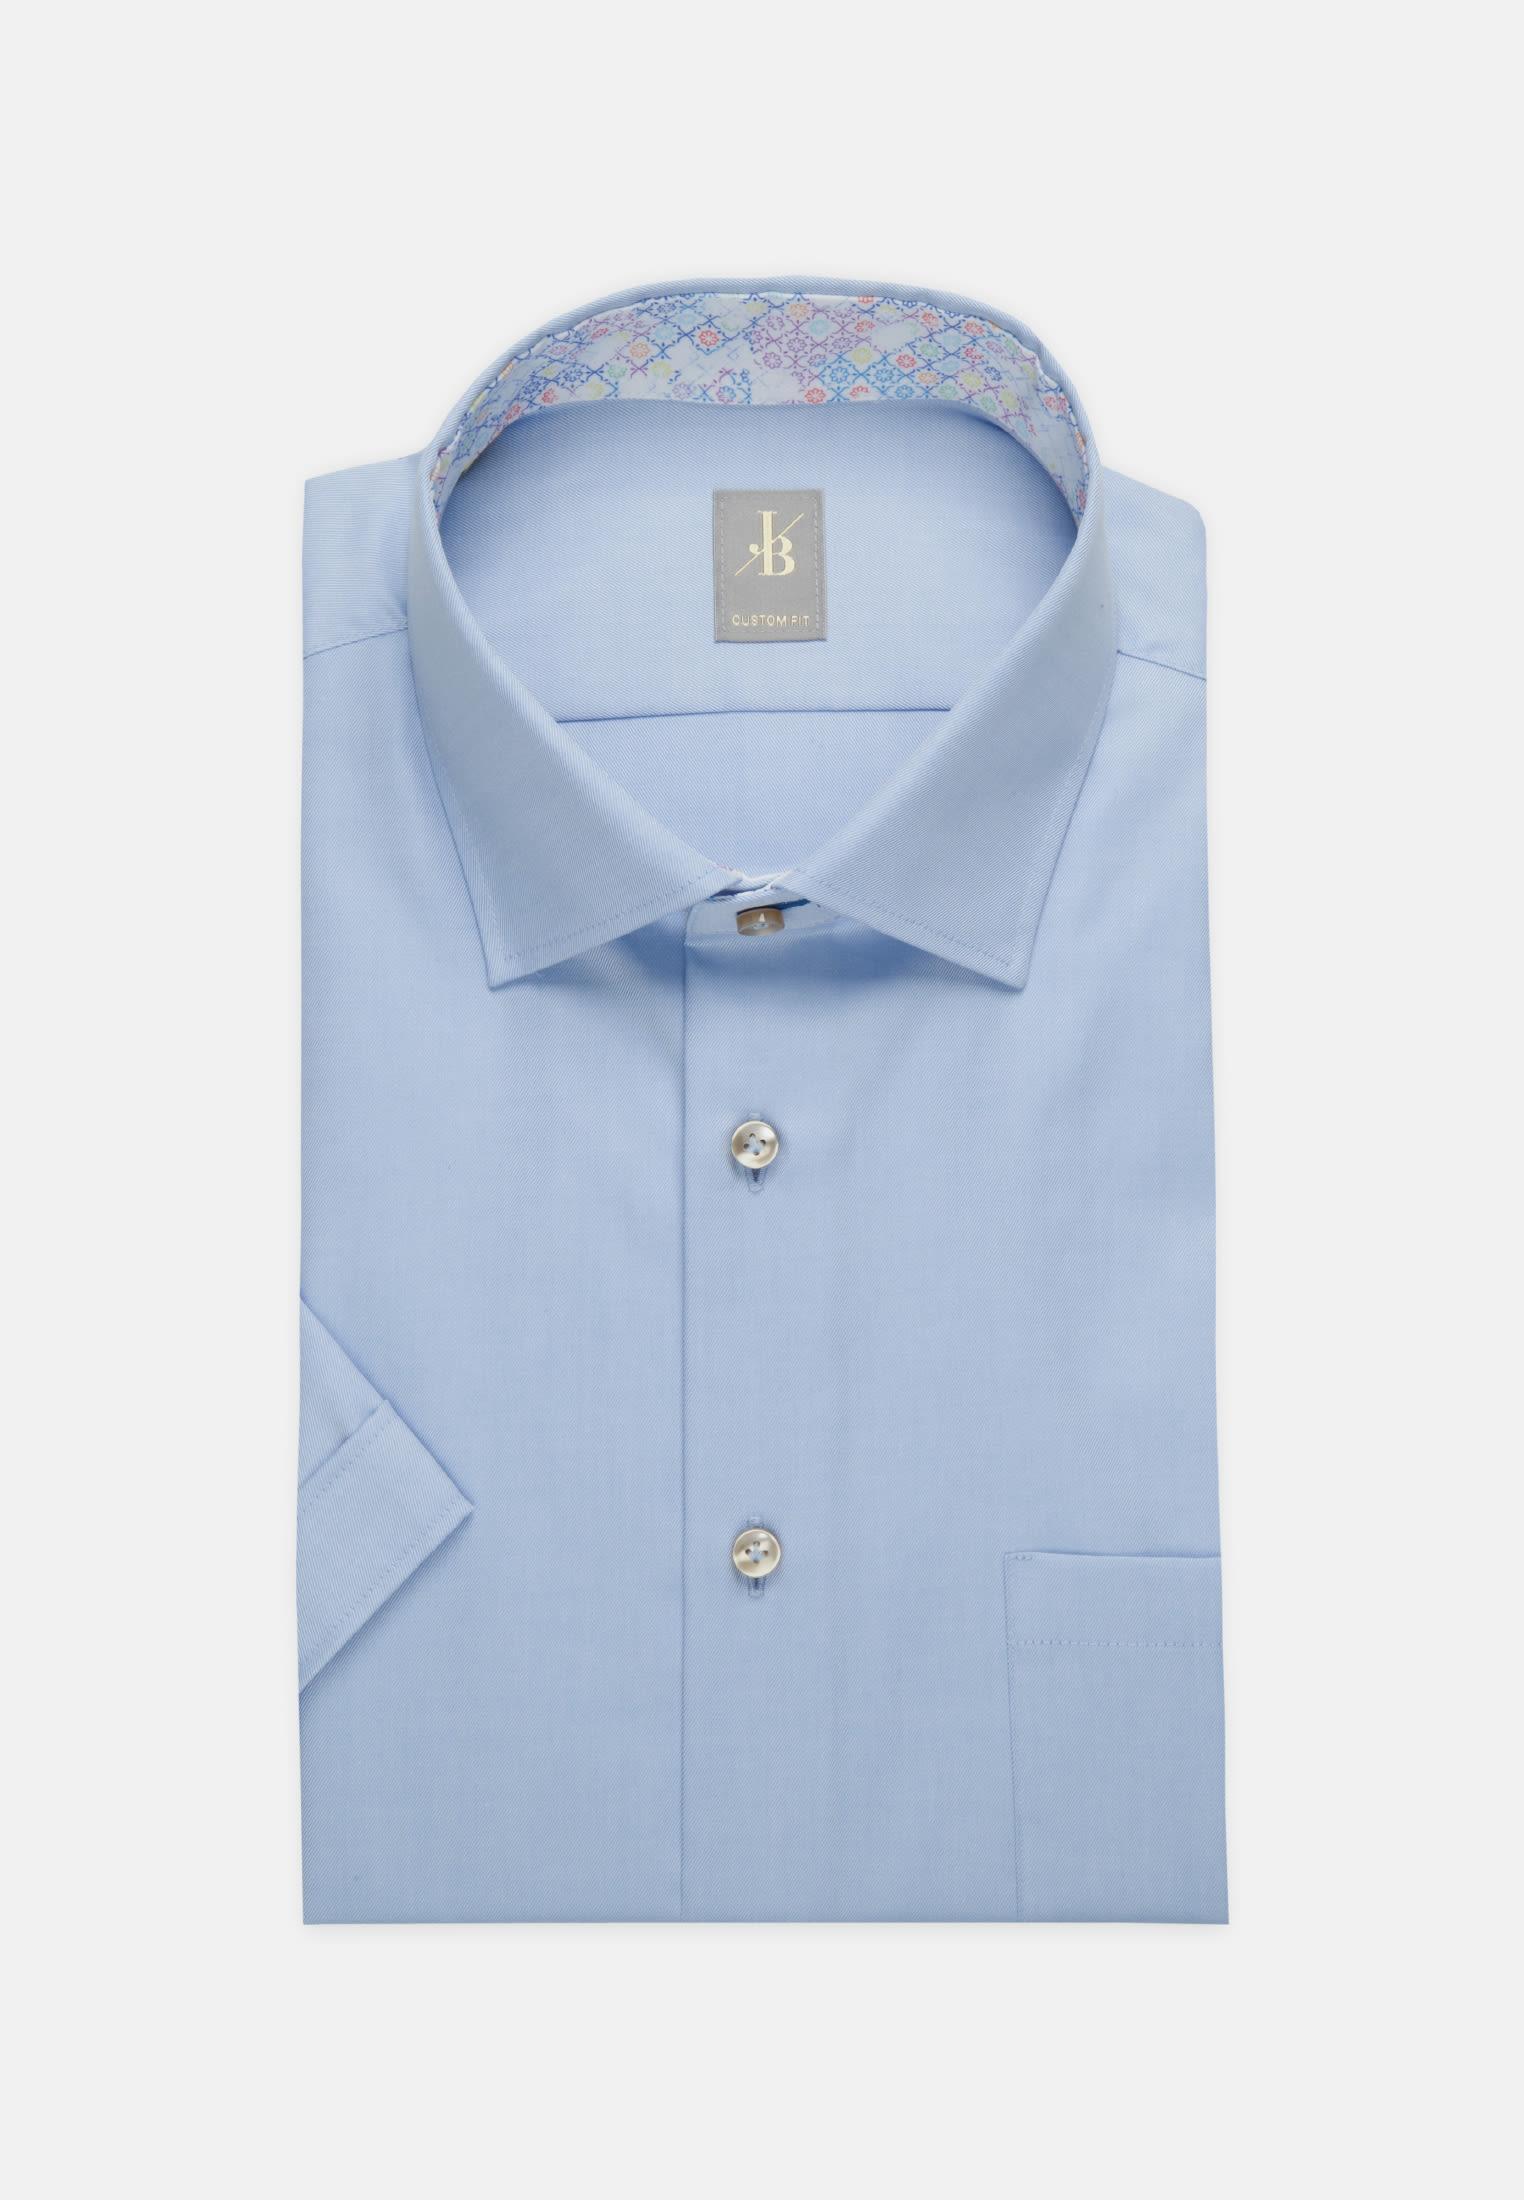 Kurzarm Twill Business Hemd in Custom Fit mit Kentkragen in Hellblau    Jacques Britt Onlineshop